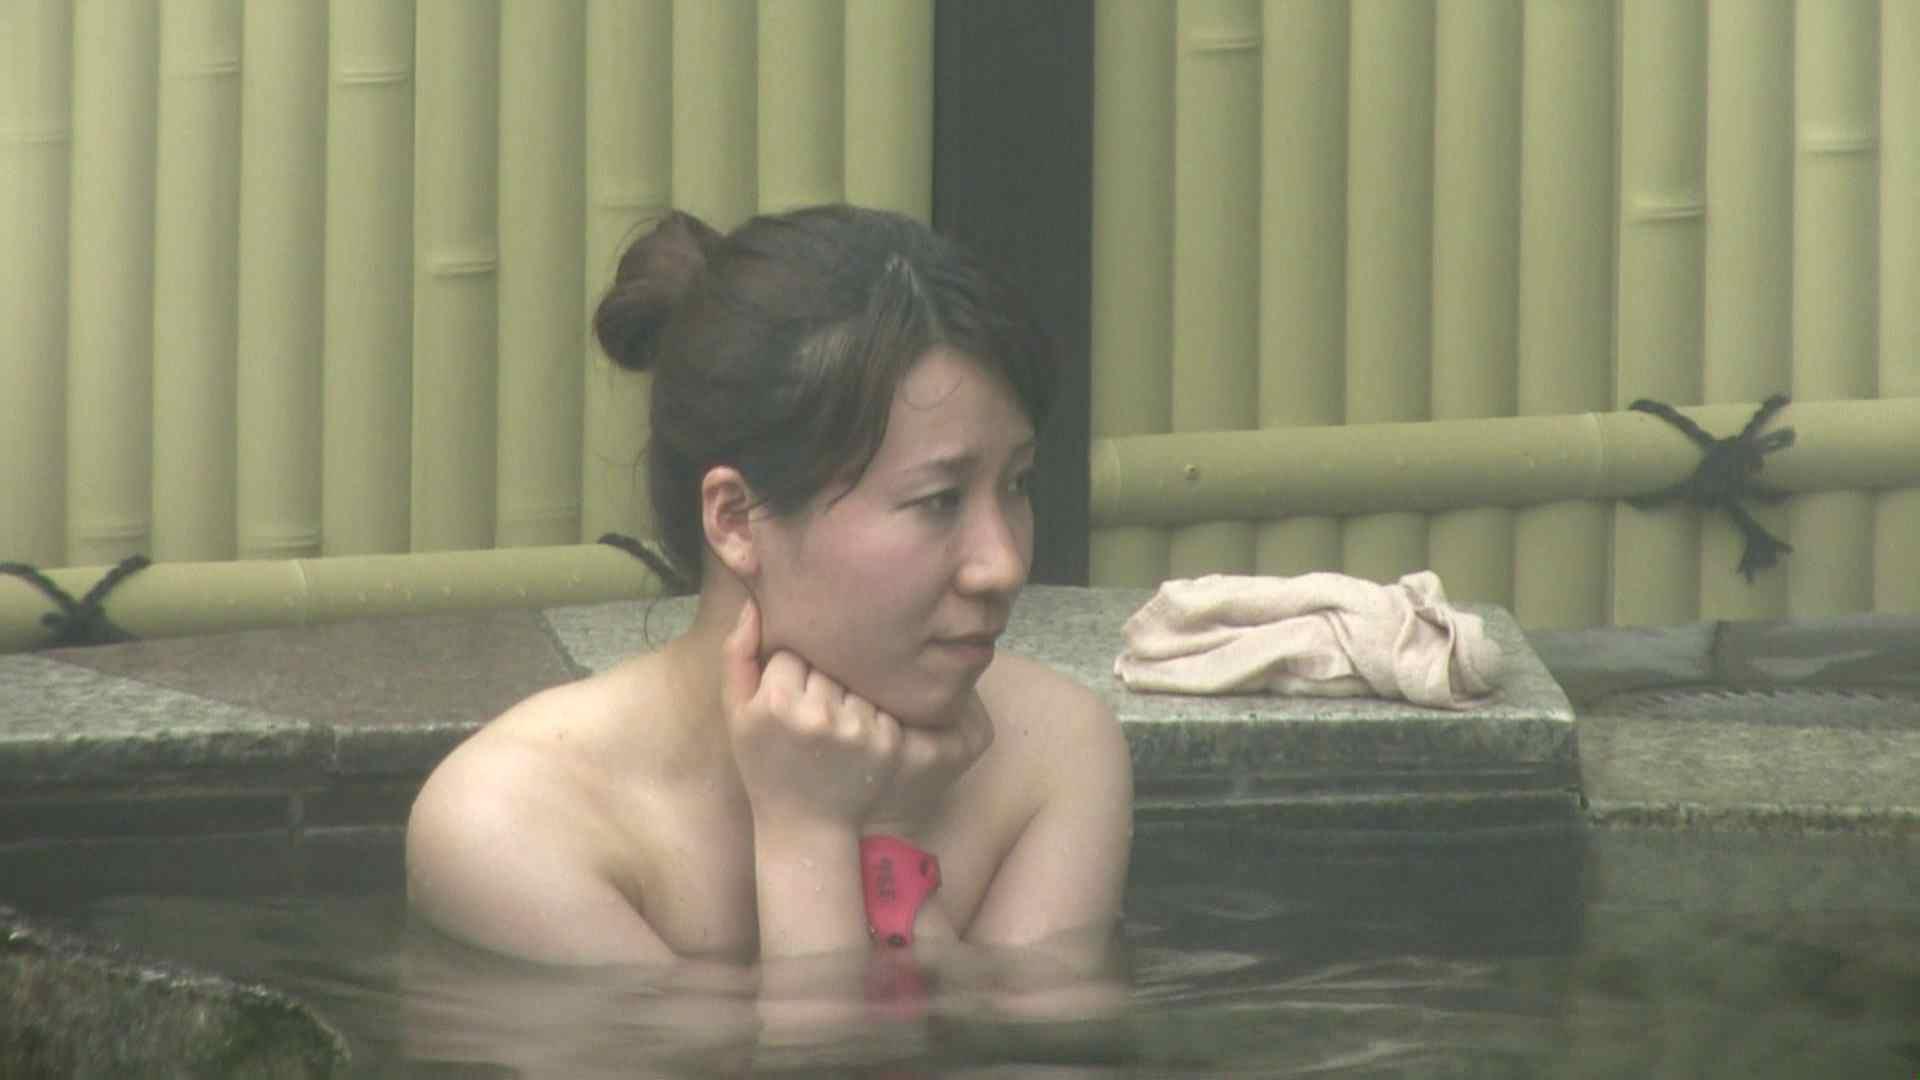 Aquaな露天風呂Vol.35【VIP】 0 | 0  105連発 101